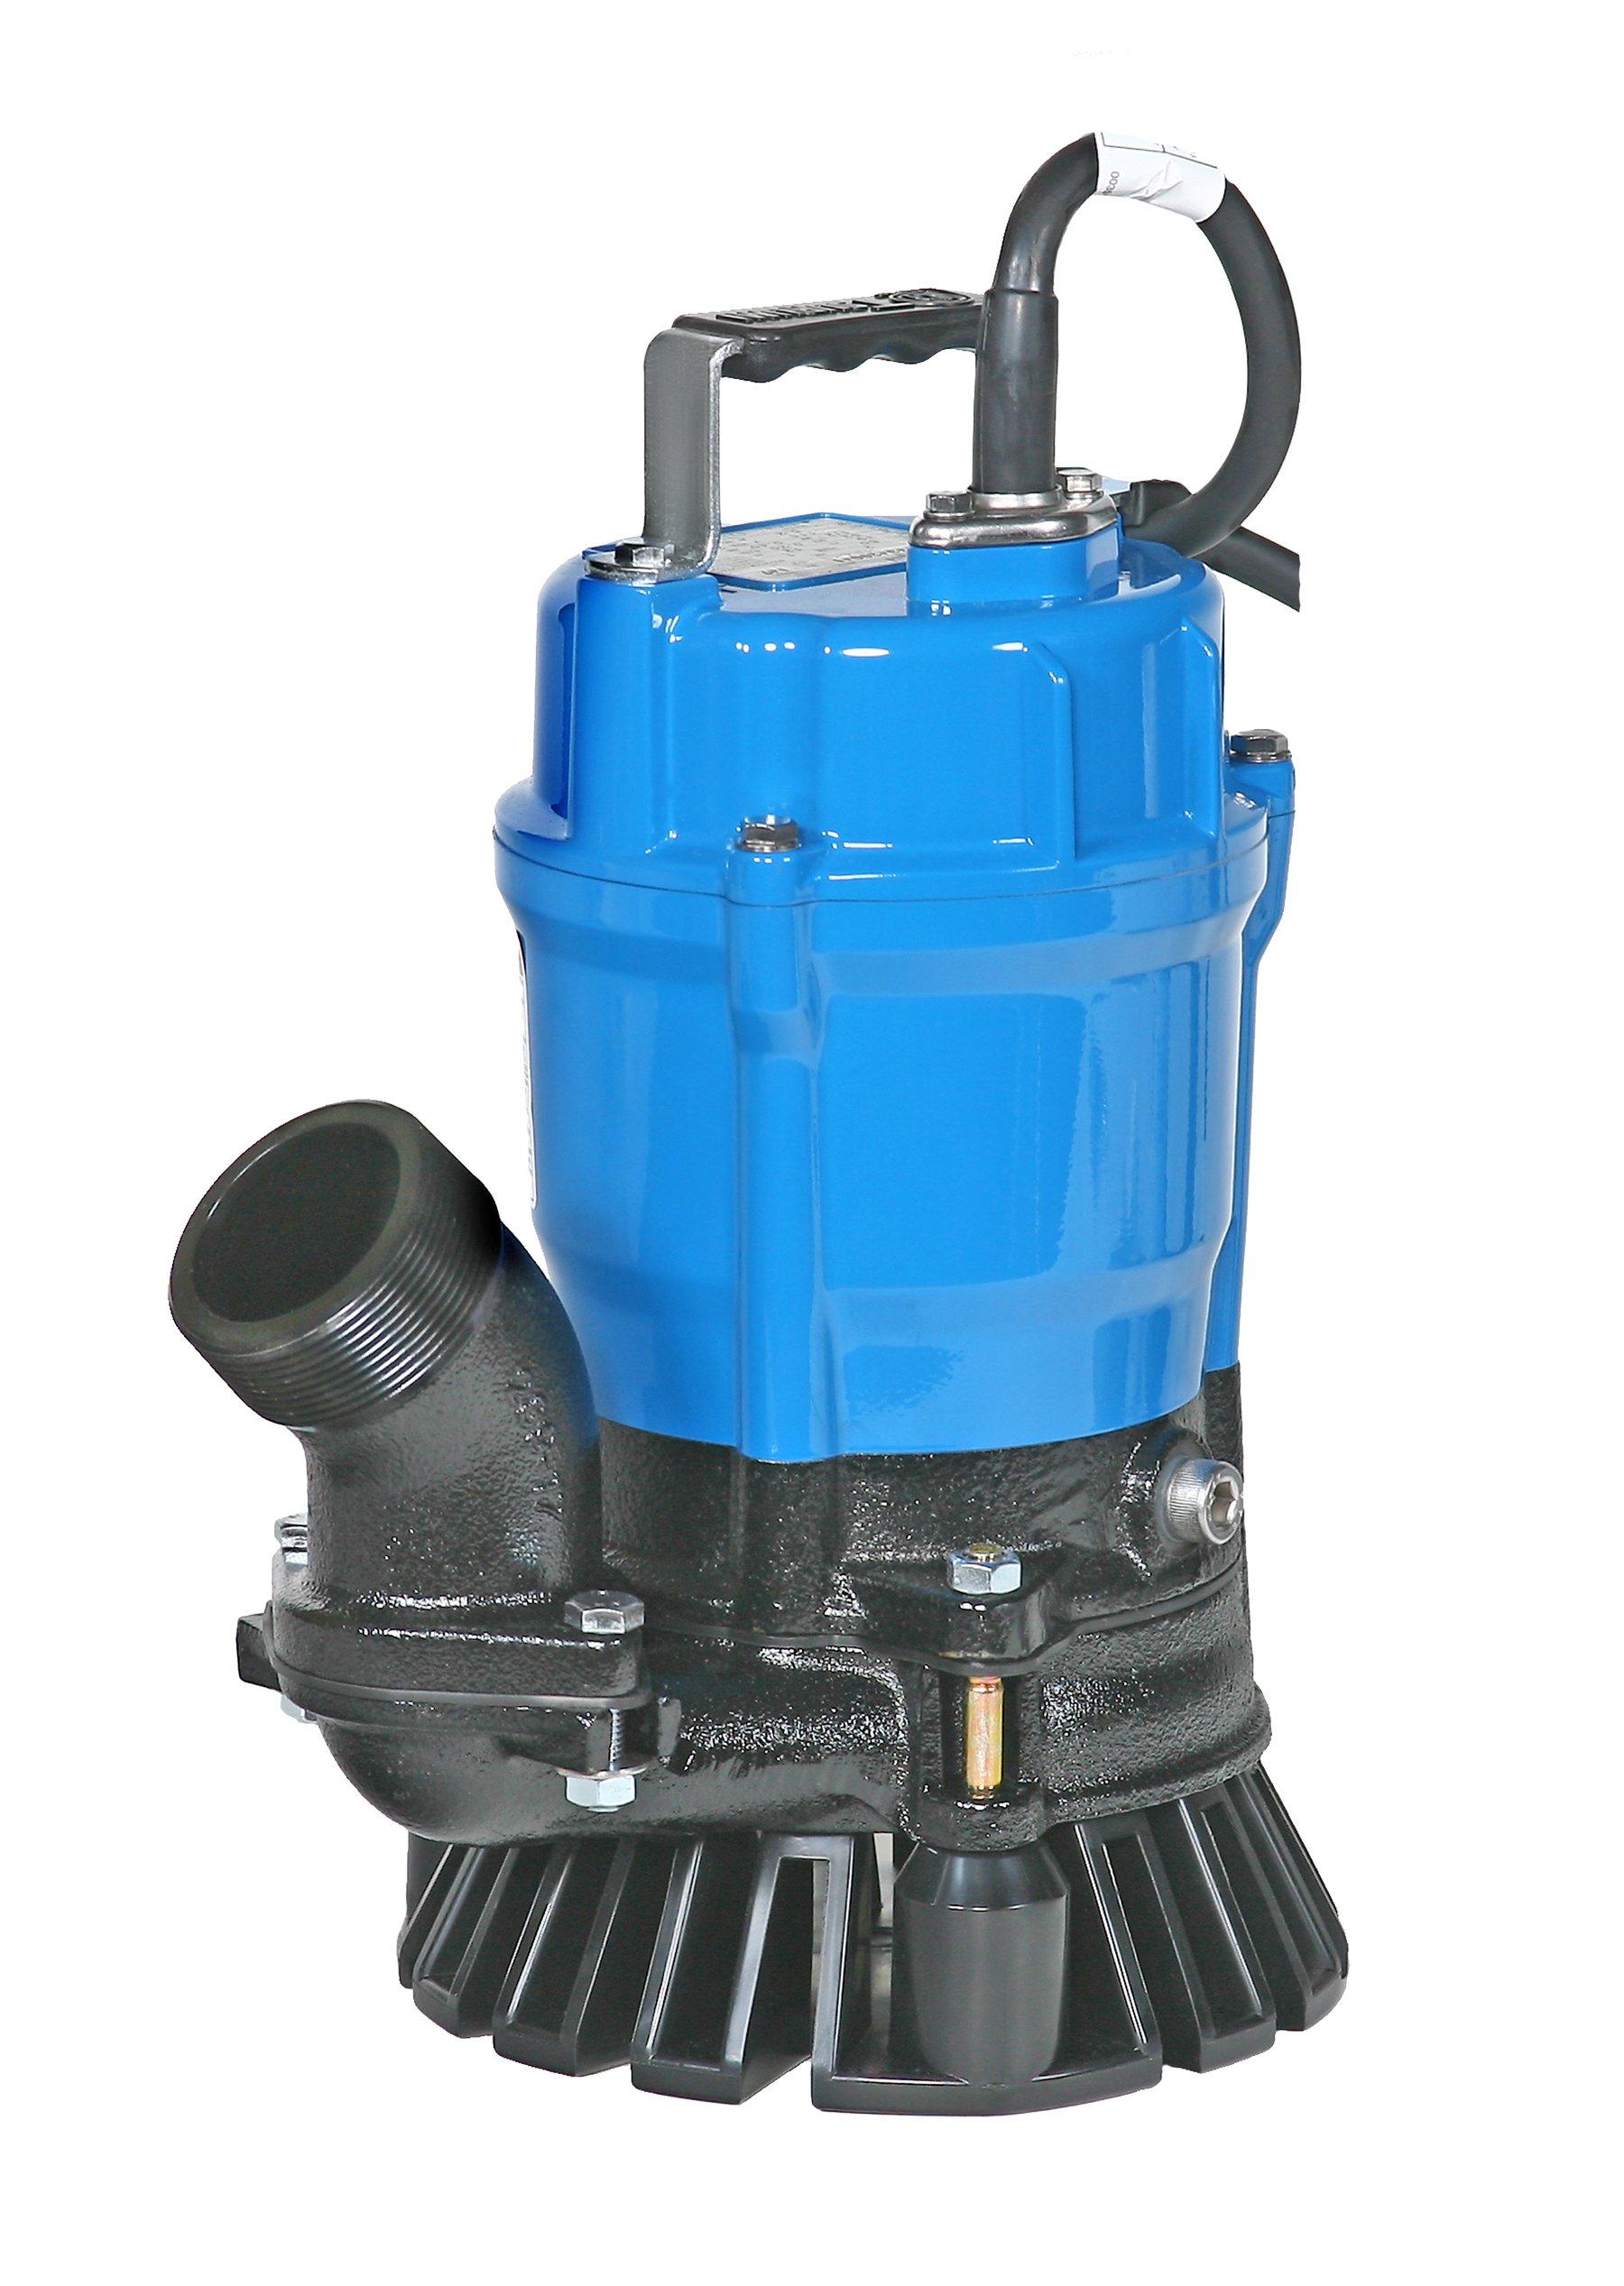 Tsurumi HS2.4S-62 Semi-Vortex Submersible Trash Pump with Agitator, 2'', 1/2 HP